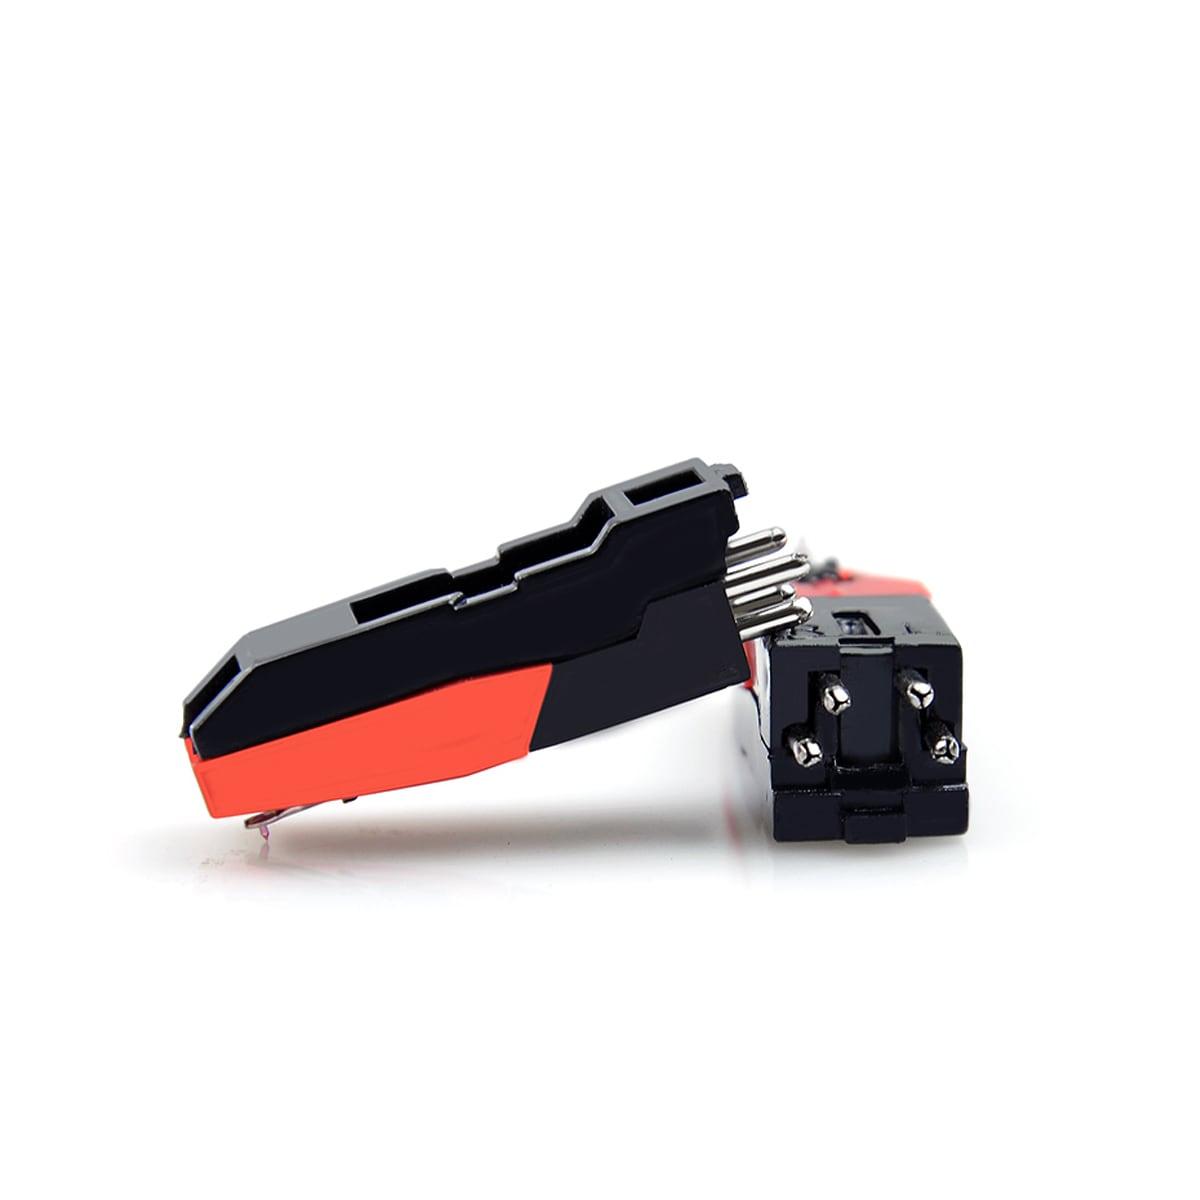 mBeat Stylus-01 Turntable Stylus Cartridge Replacement Kit - DJ City